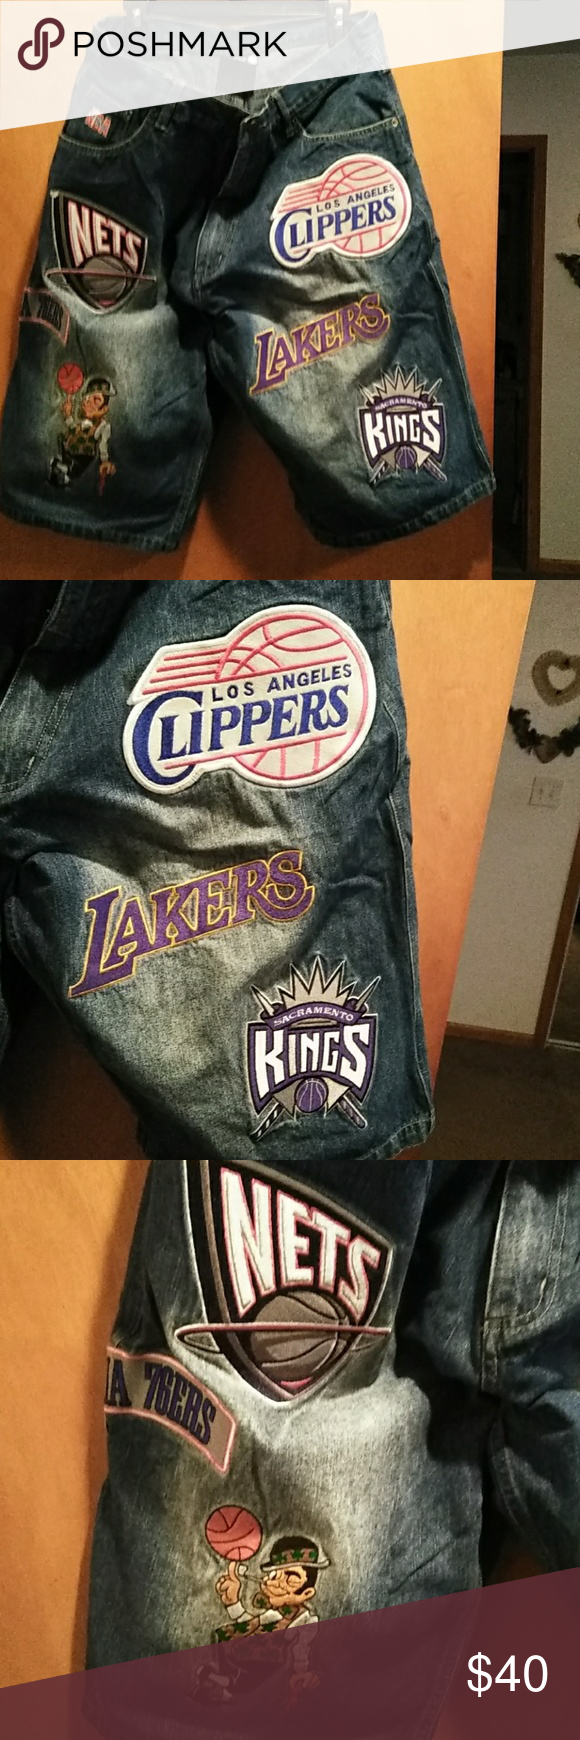 NBA logo shorts in 2020 Nba logo, Logo shorts, Lakers logo